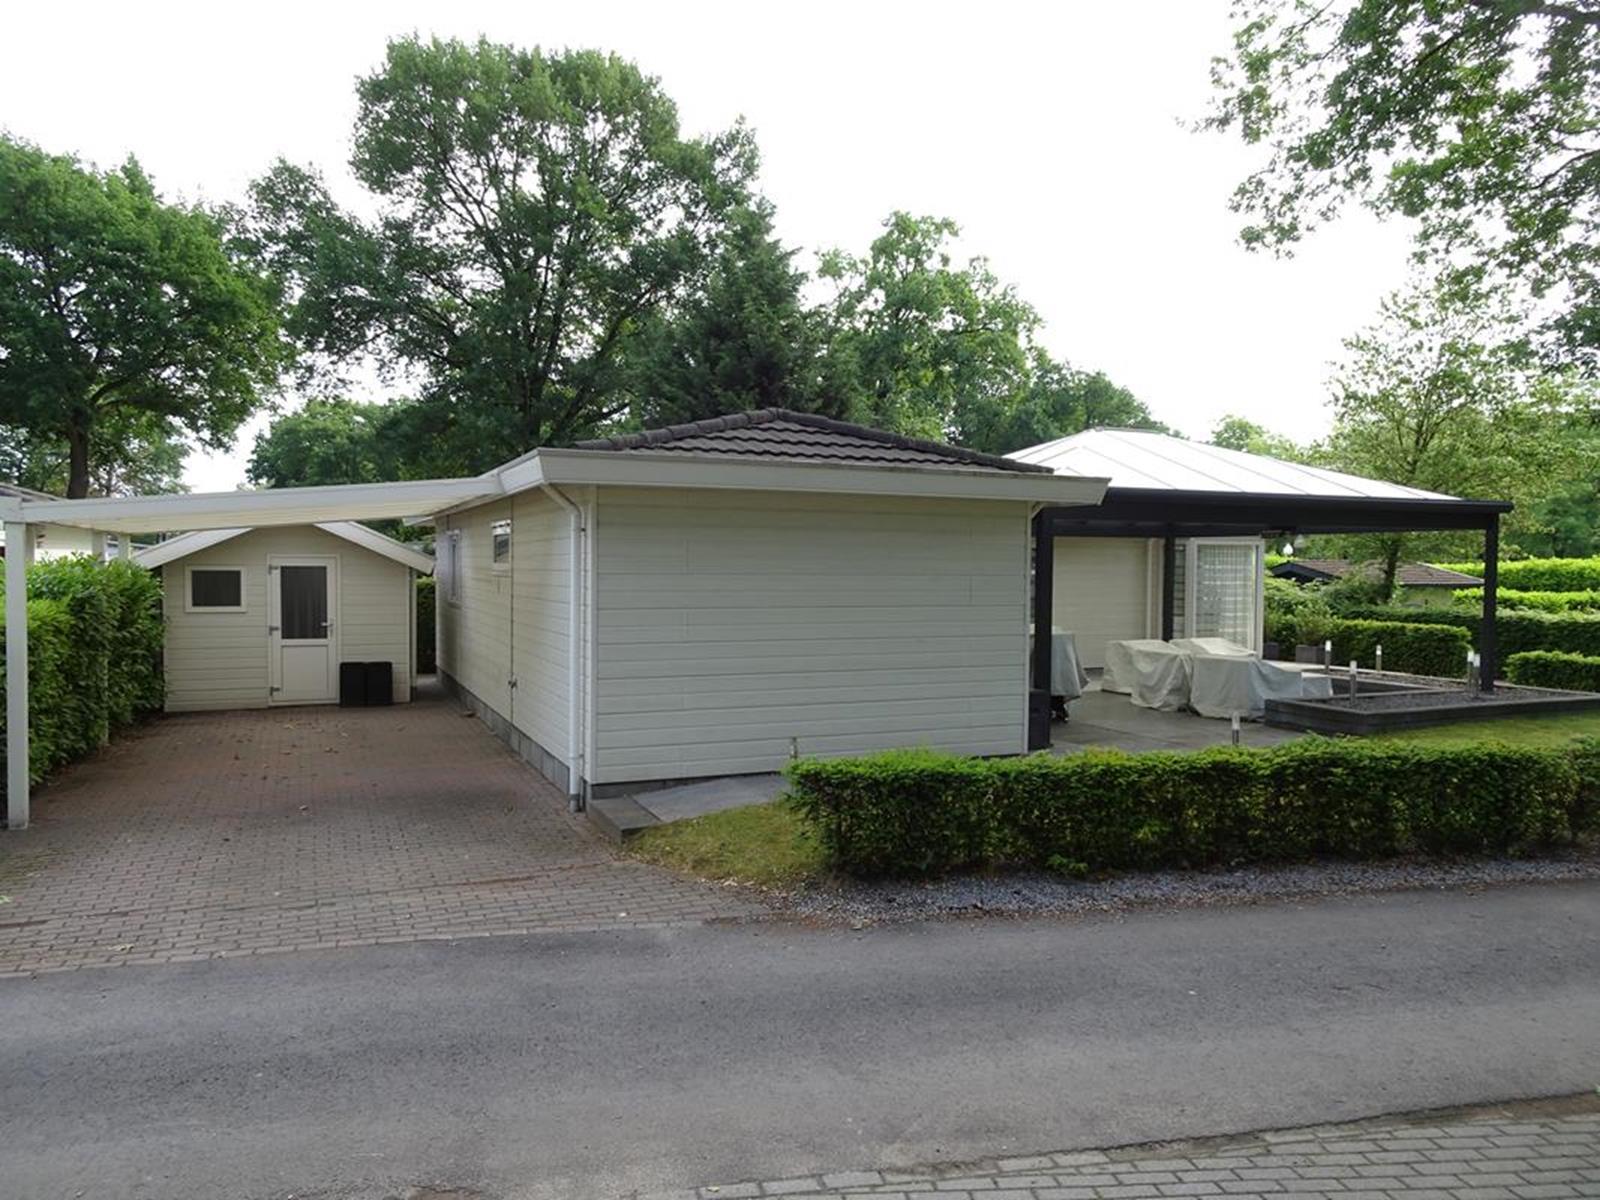 Vakantiehuis te koop Limburg Susteren Hommelweg 2 K121 (24).jpg